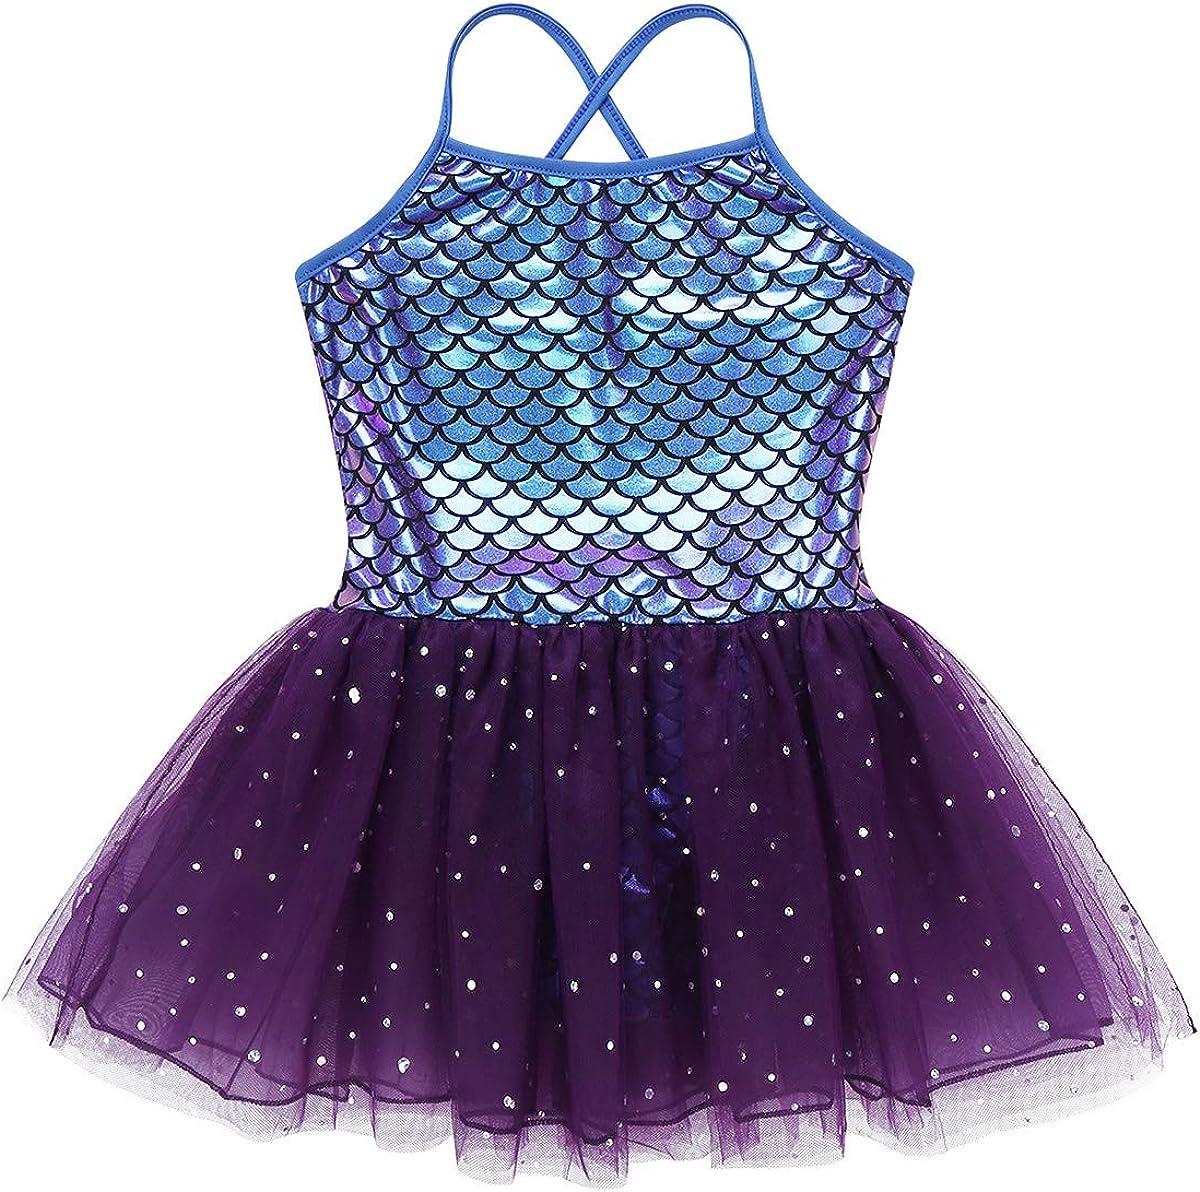 inhzoy Kids Girls Mermaid Camisole Leotard Ballet Dance Tutu Dress Sparkly Skirted Gymnastics Outfits